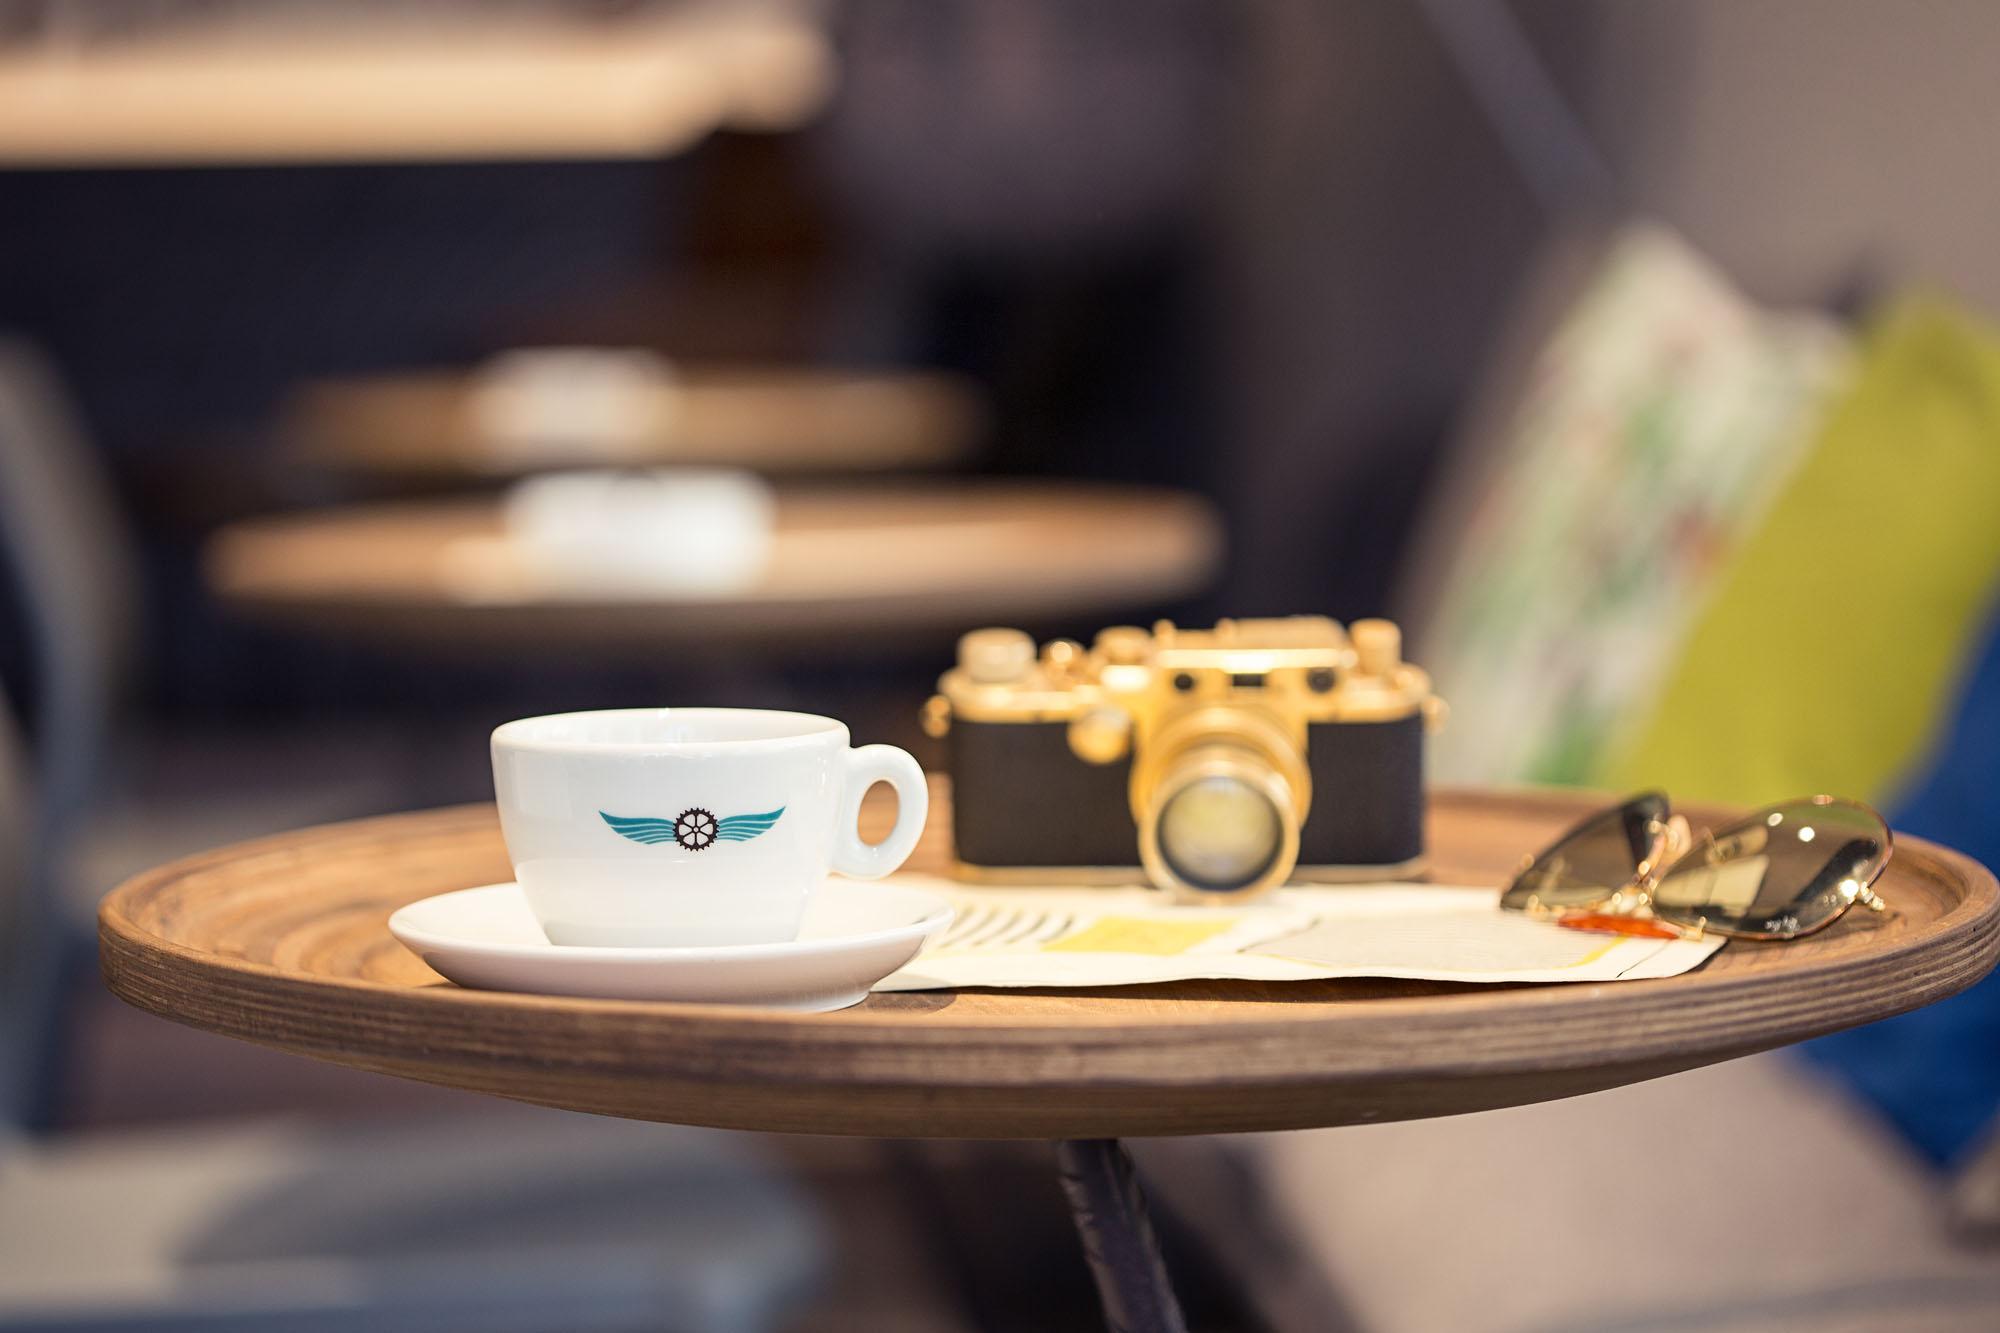 dropcaffe, drop cafe, drob a1 blok, mirko nahmijas, brending, pecatipotpis, pecat i potpis